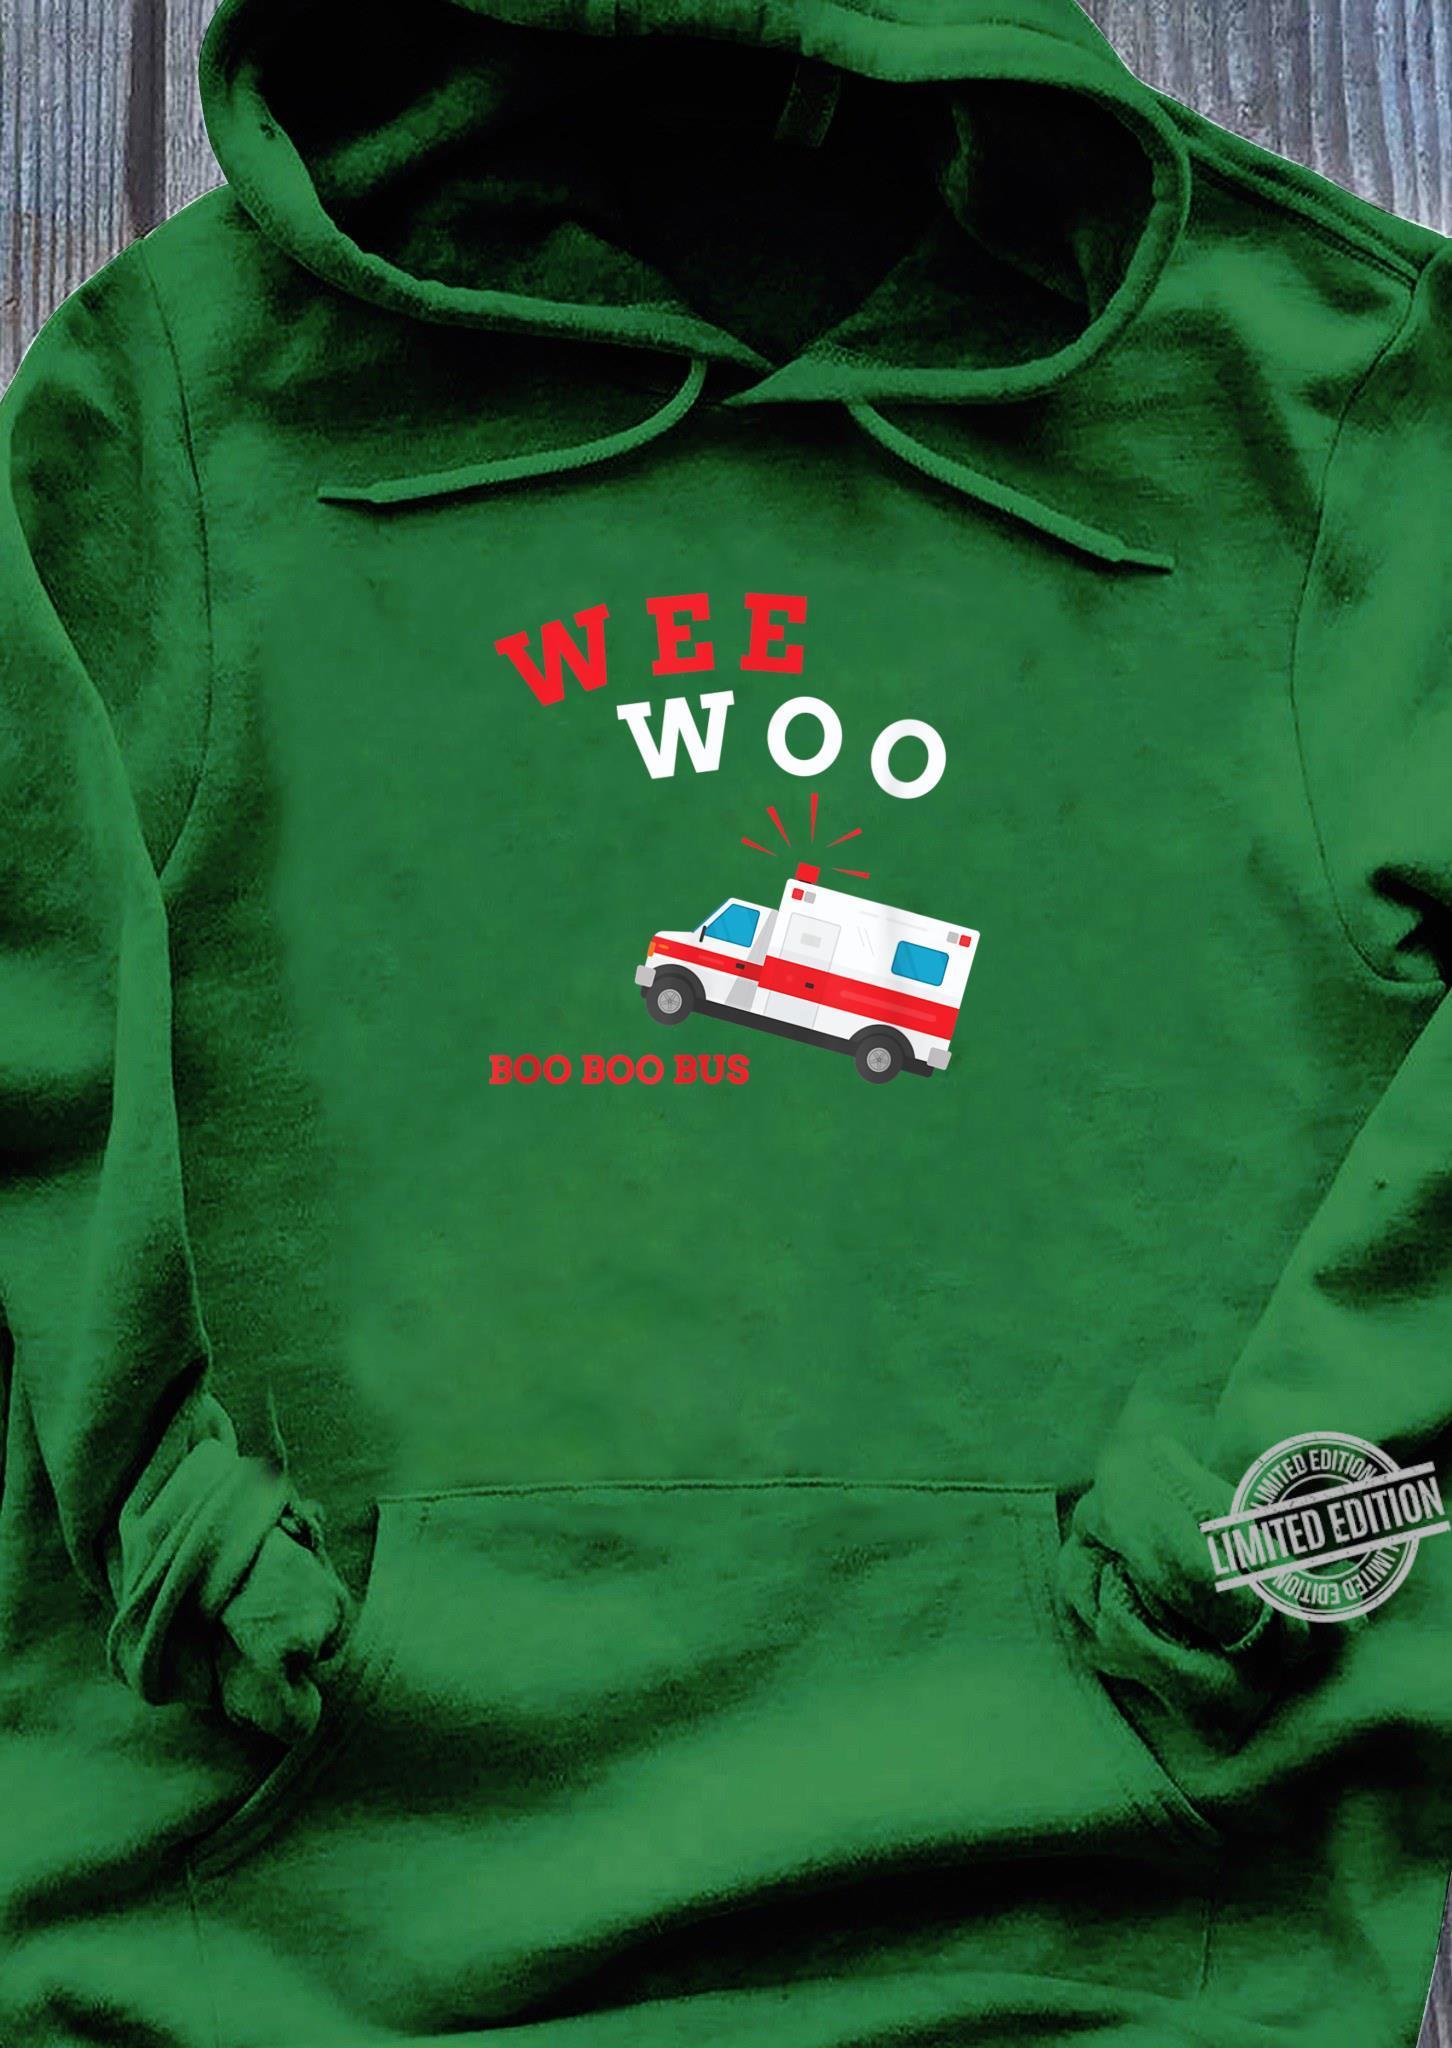 Emt Sanitäter Krankenwagen Boo Boo Bus Wee Woo Shirt hoodie